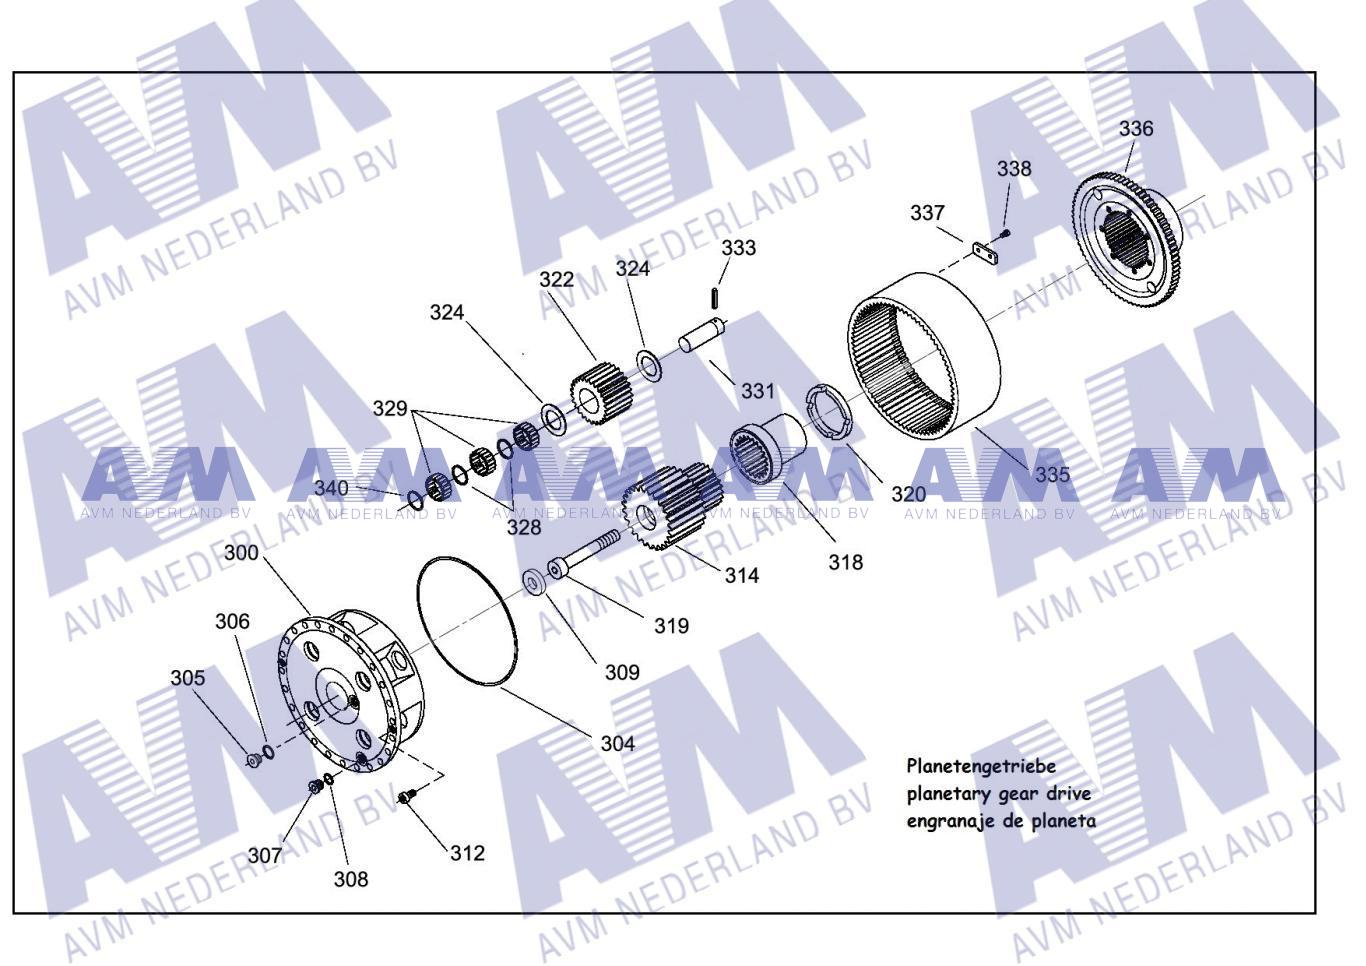 Tekening Eindplanetair 4p PL324-3217-67-1 Kessler